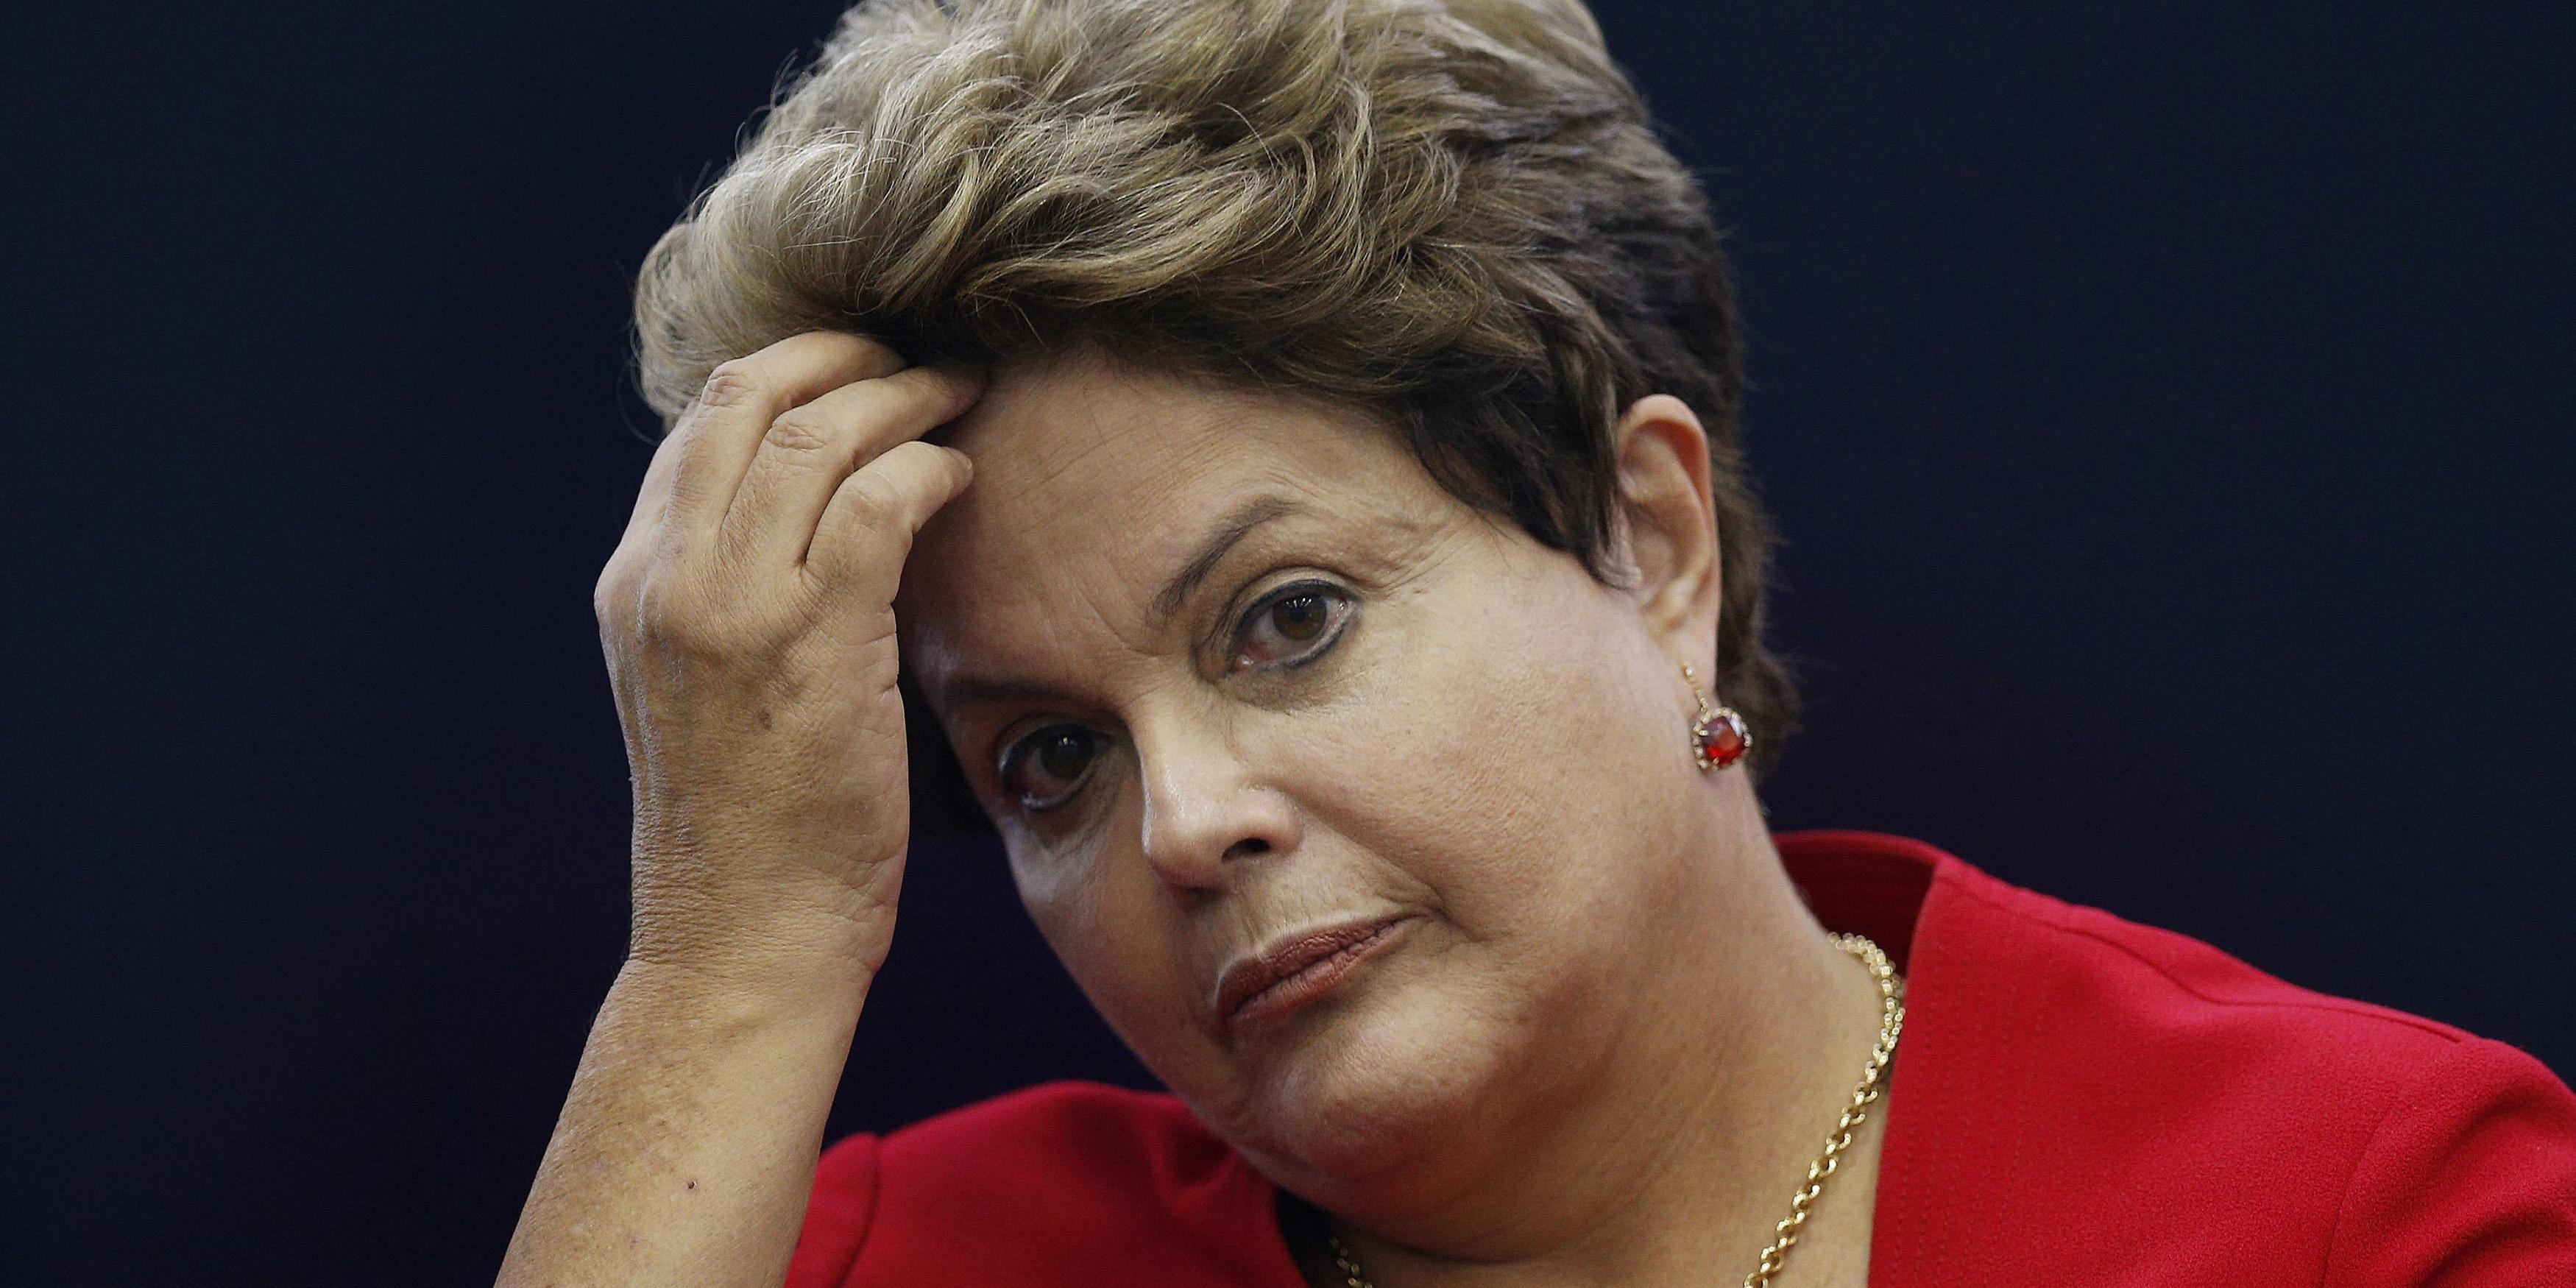 Brazil-News-Dilma-Rousseff-In-The-News-Headline-Now